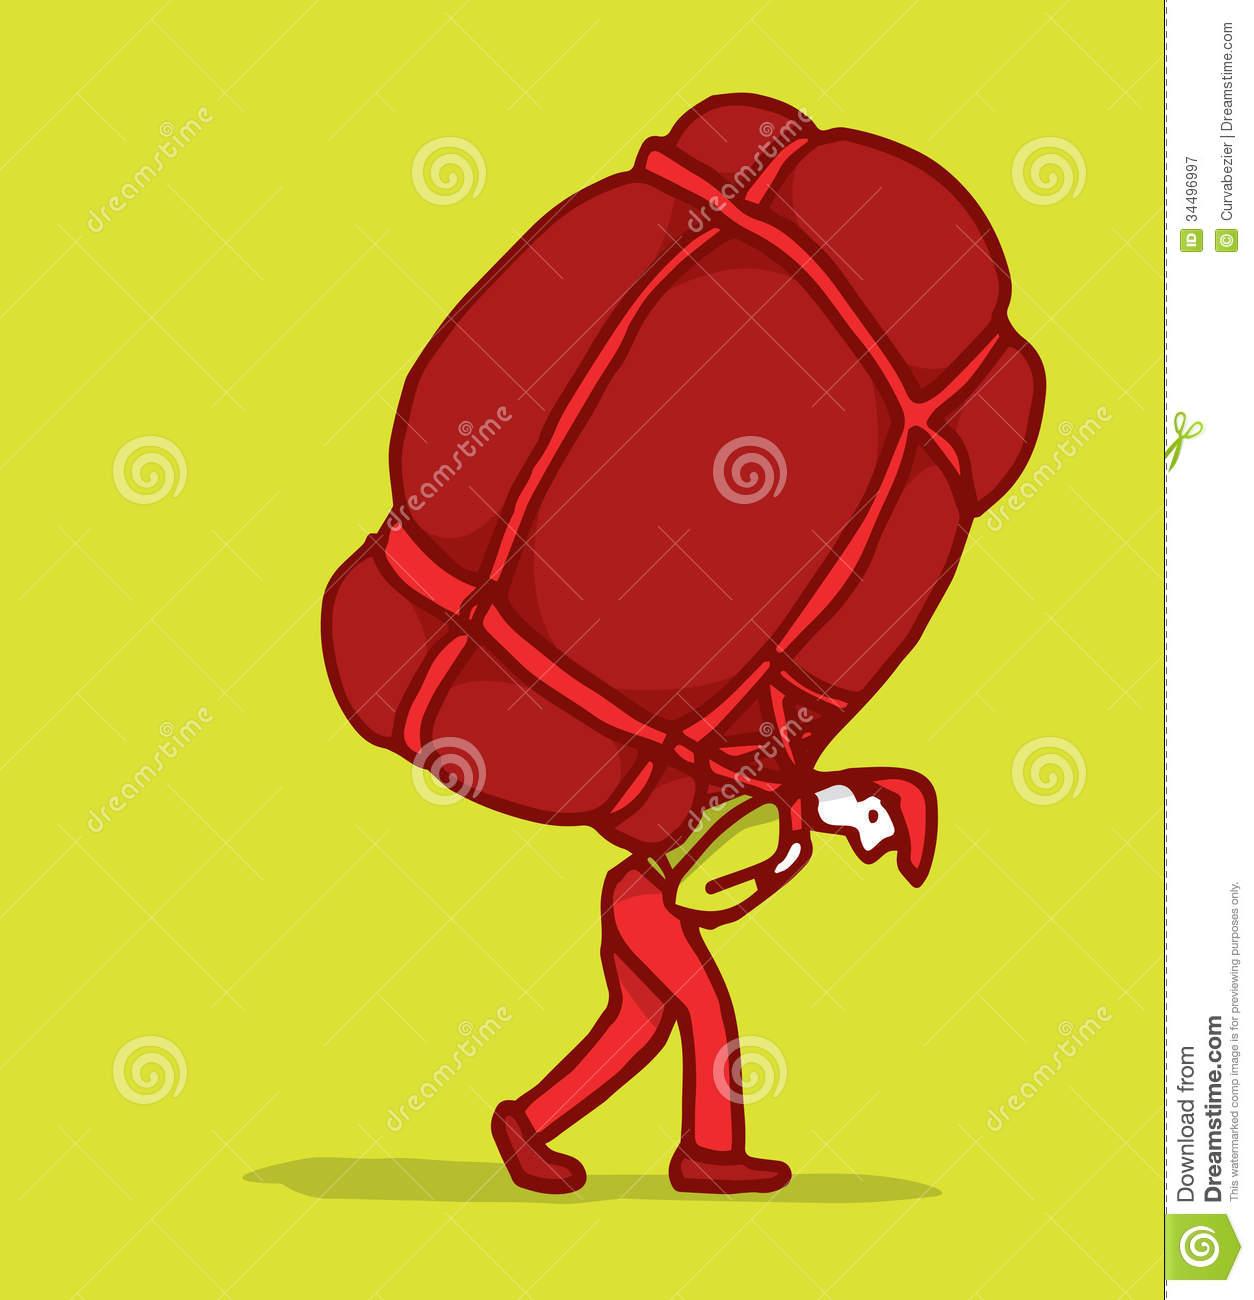 Carrying burden clipart.